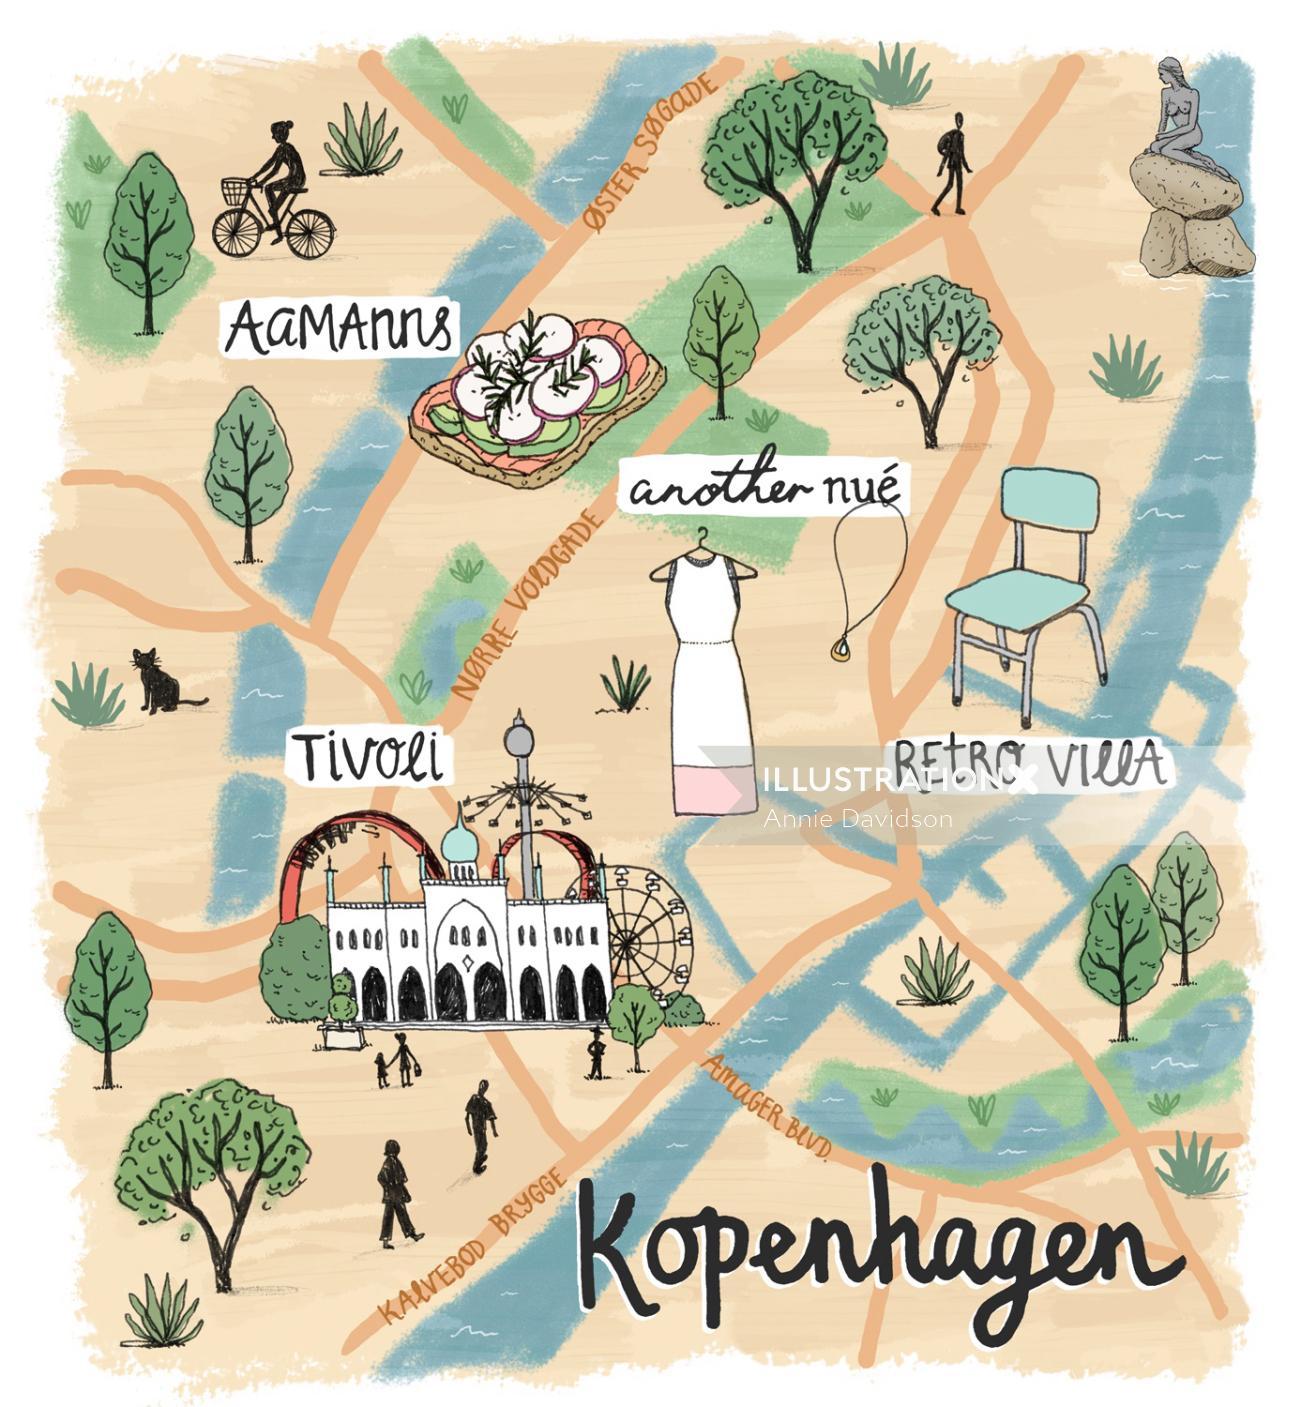 Kopenhagen map illustration